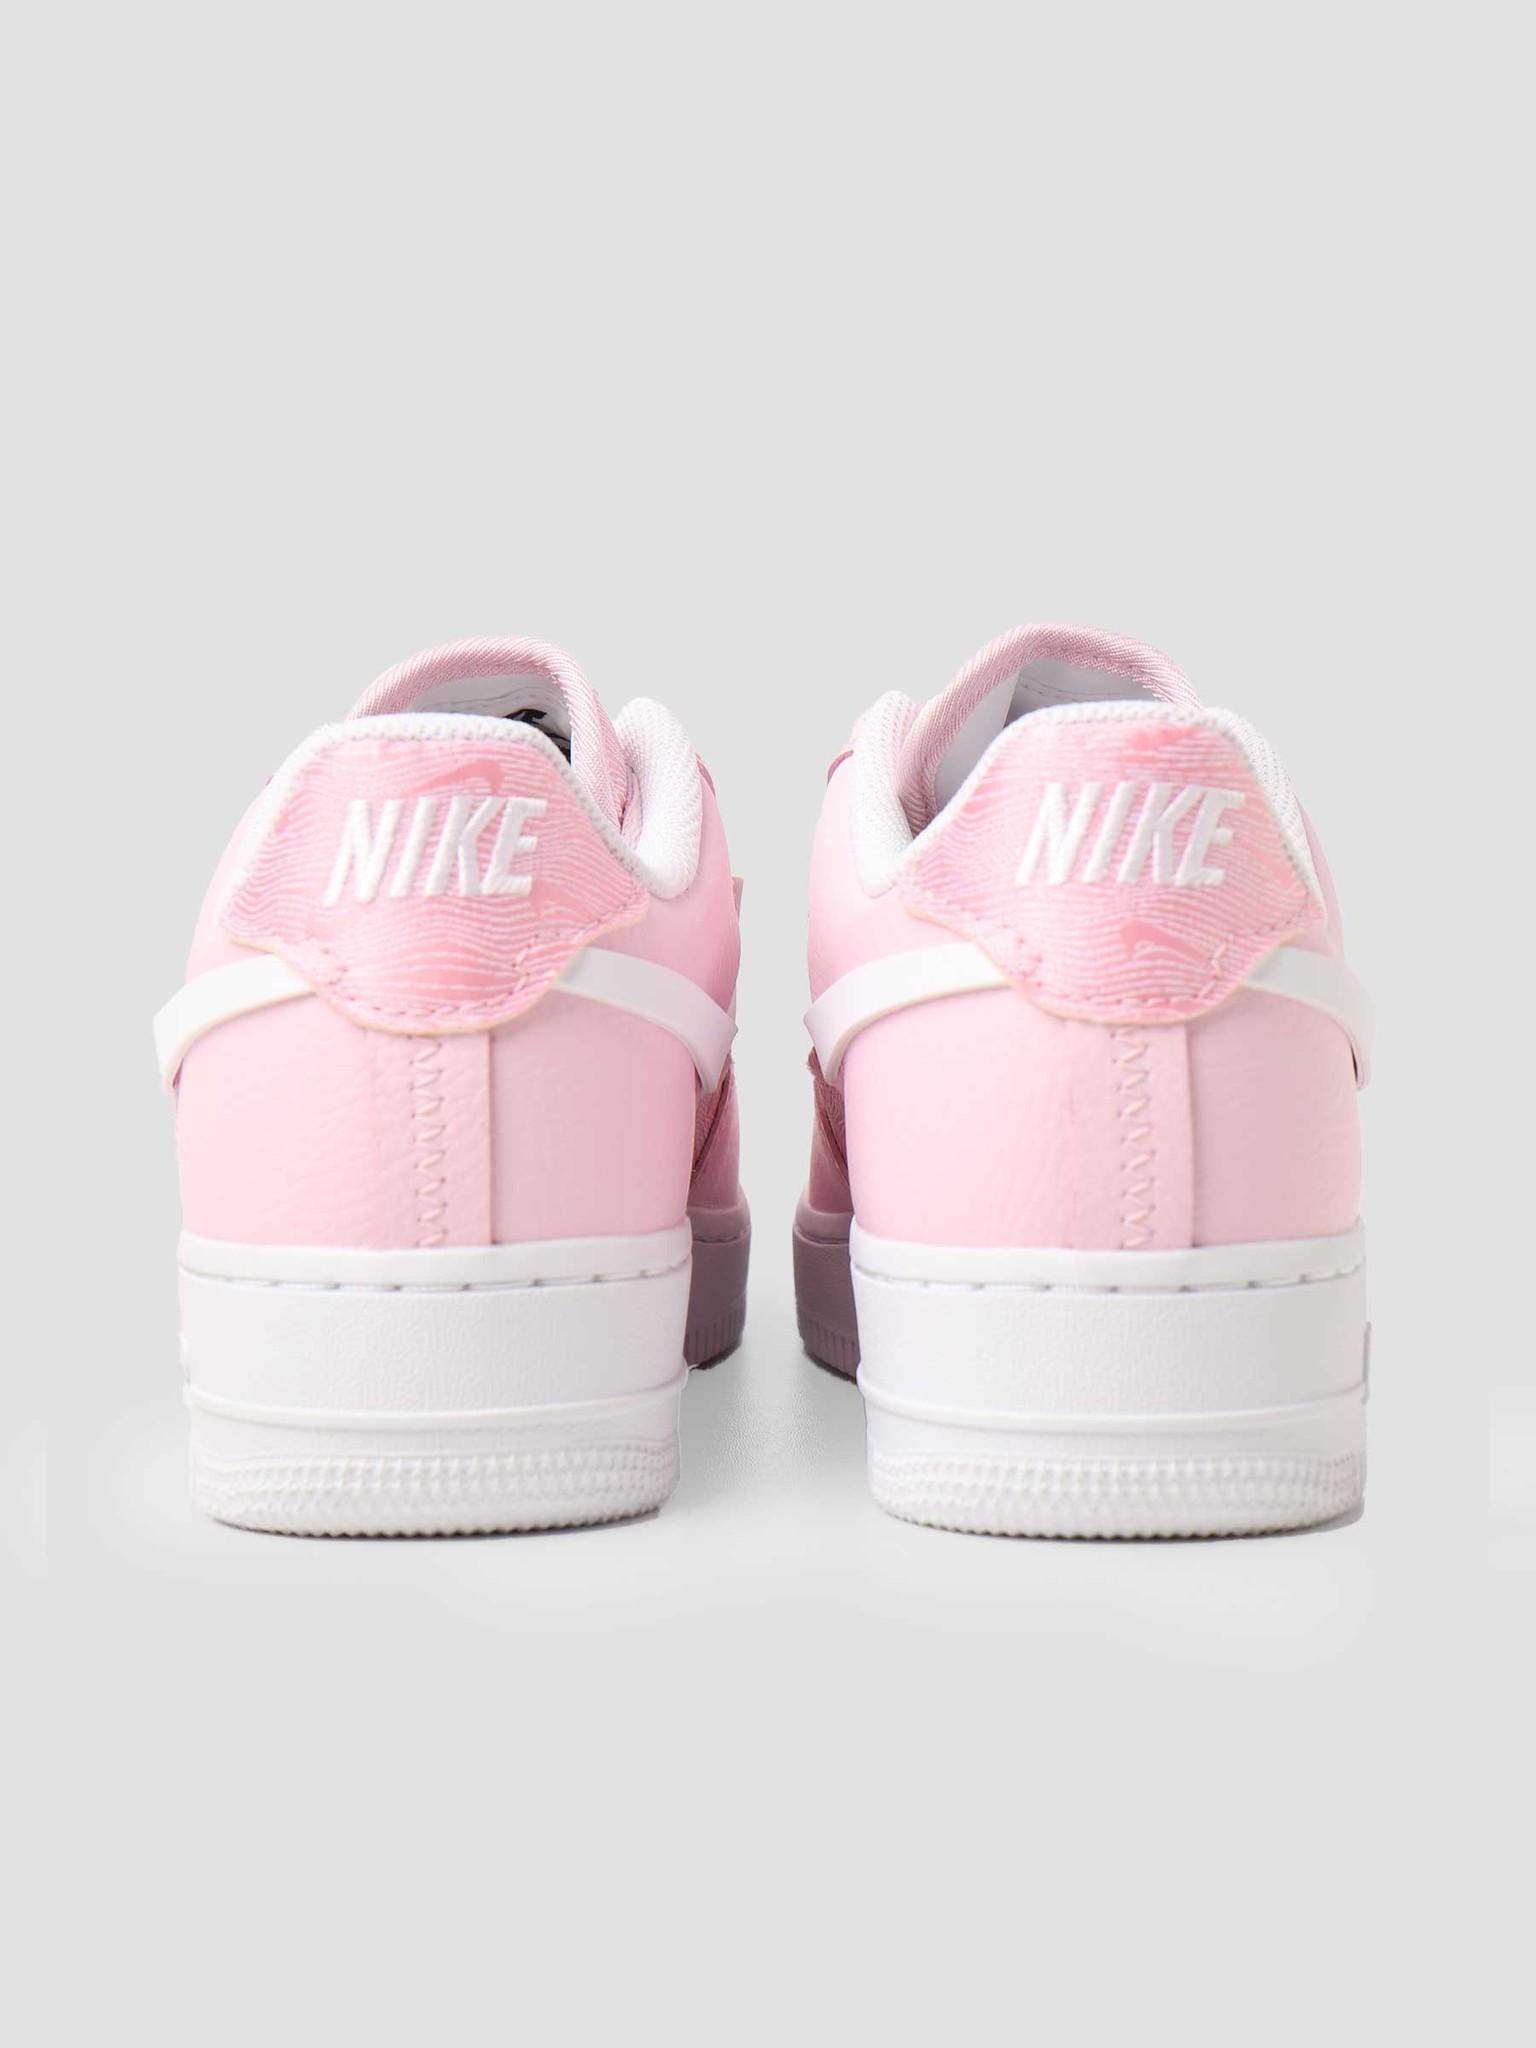 Nike Nike W Nike Af1 Lxx Pink Foam  White Black DJ6904-600